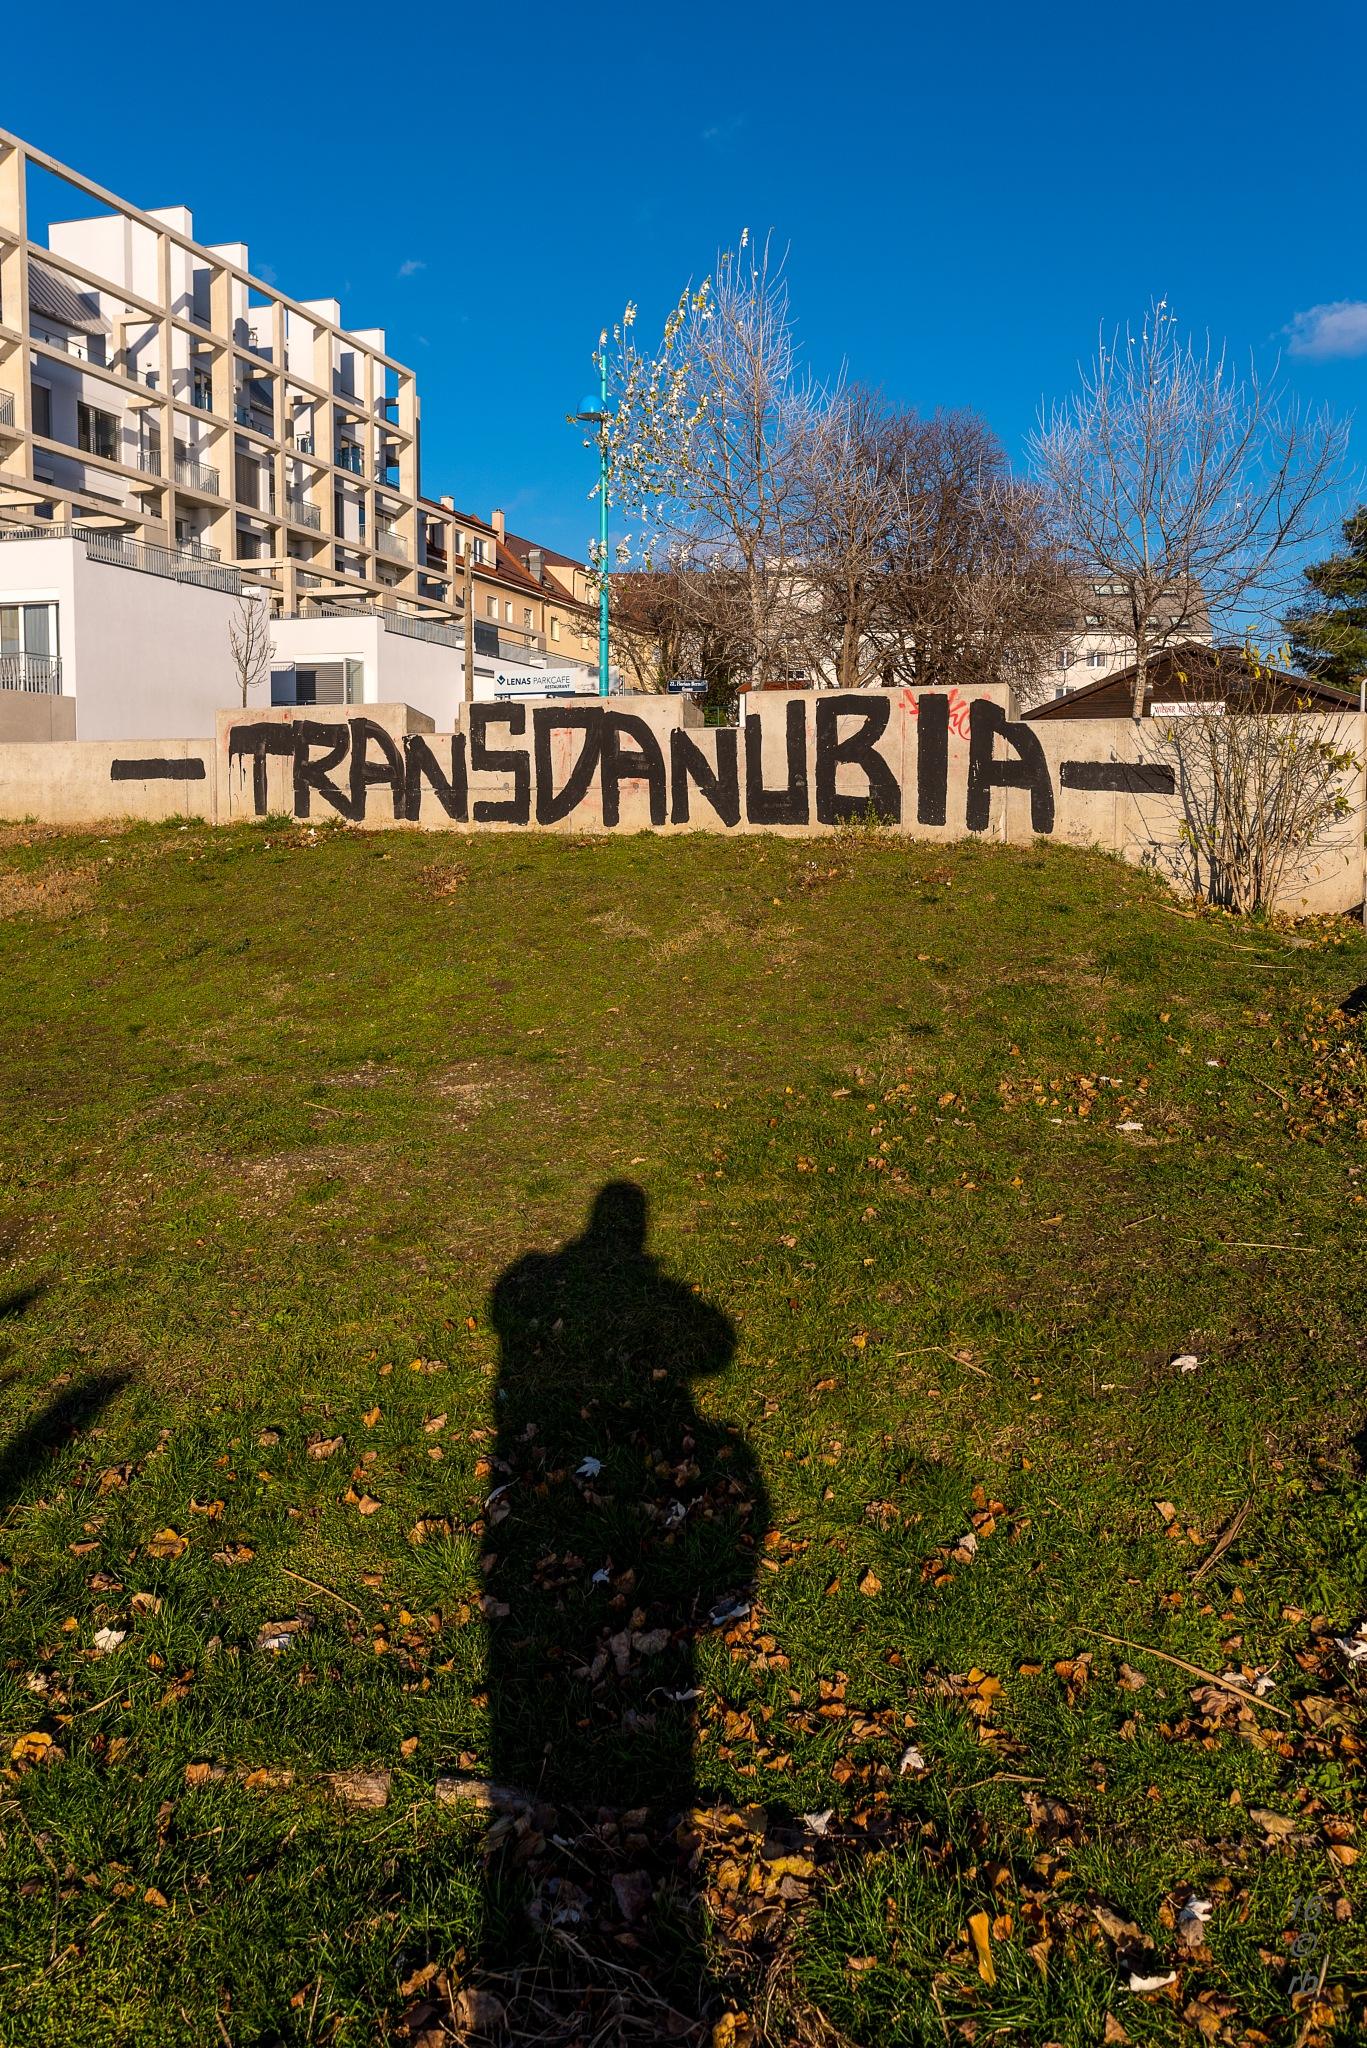 Transdanubia by > Robert Braun <